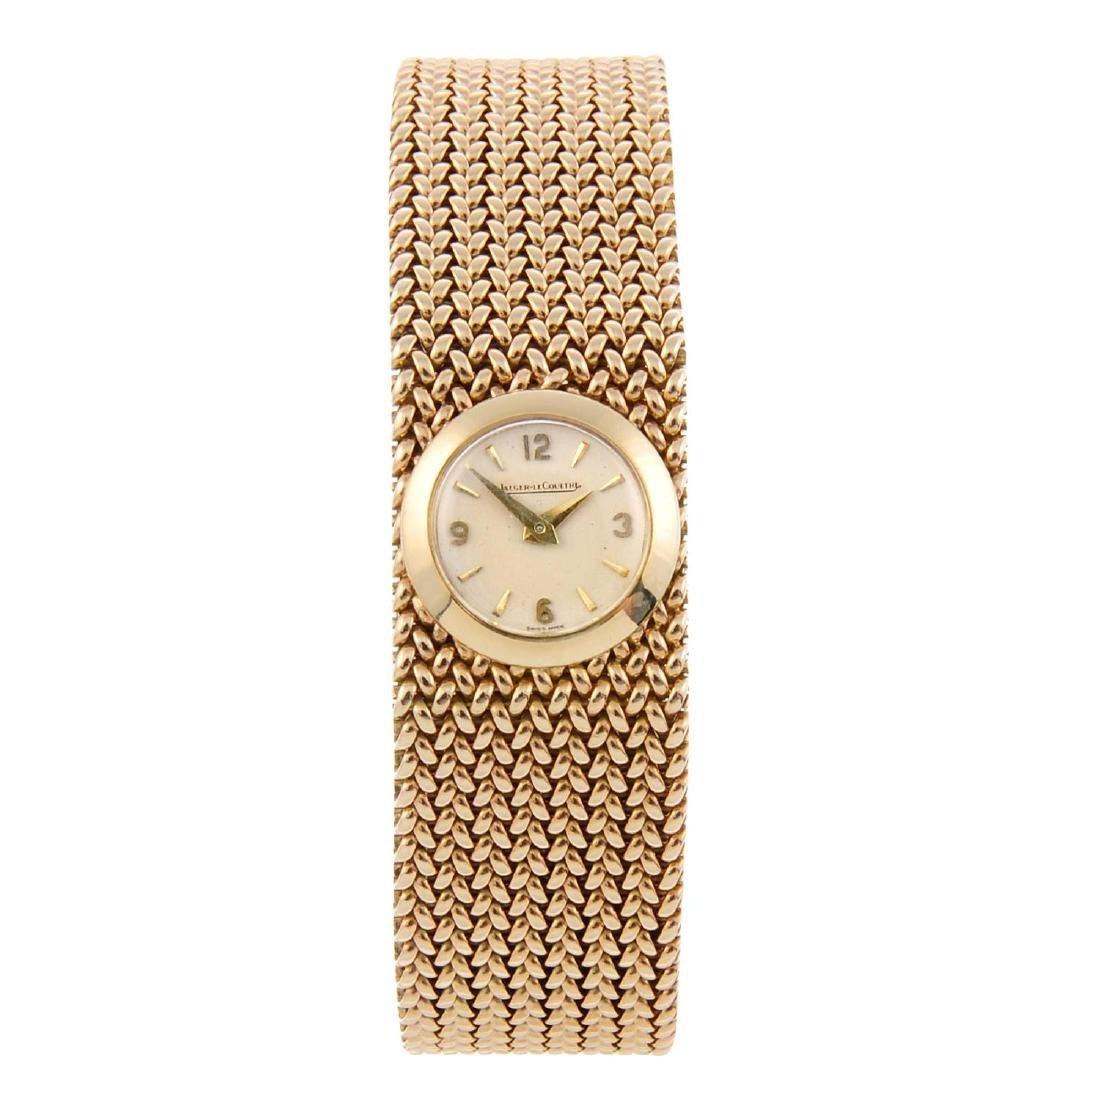 JAEGER-LECOULTRE - a lady's bracelet watch. 9ct yellow